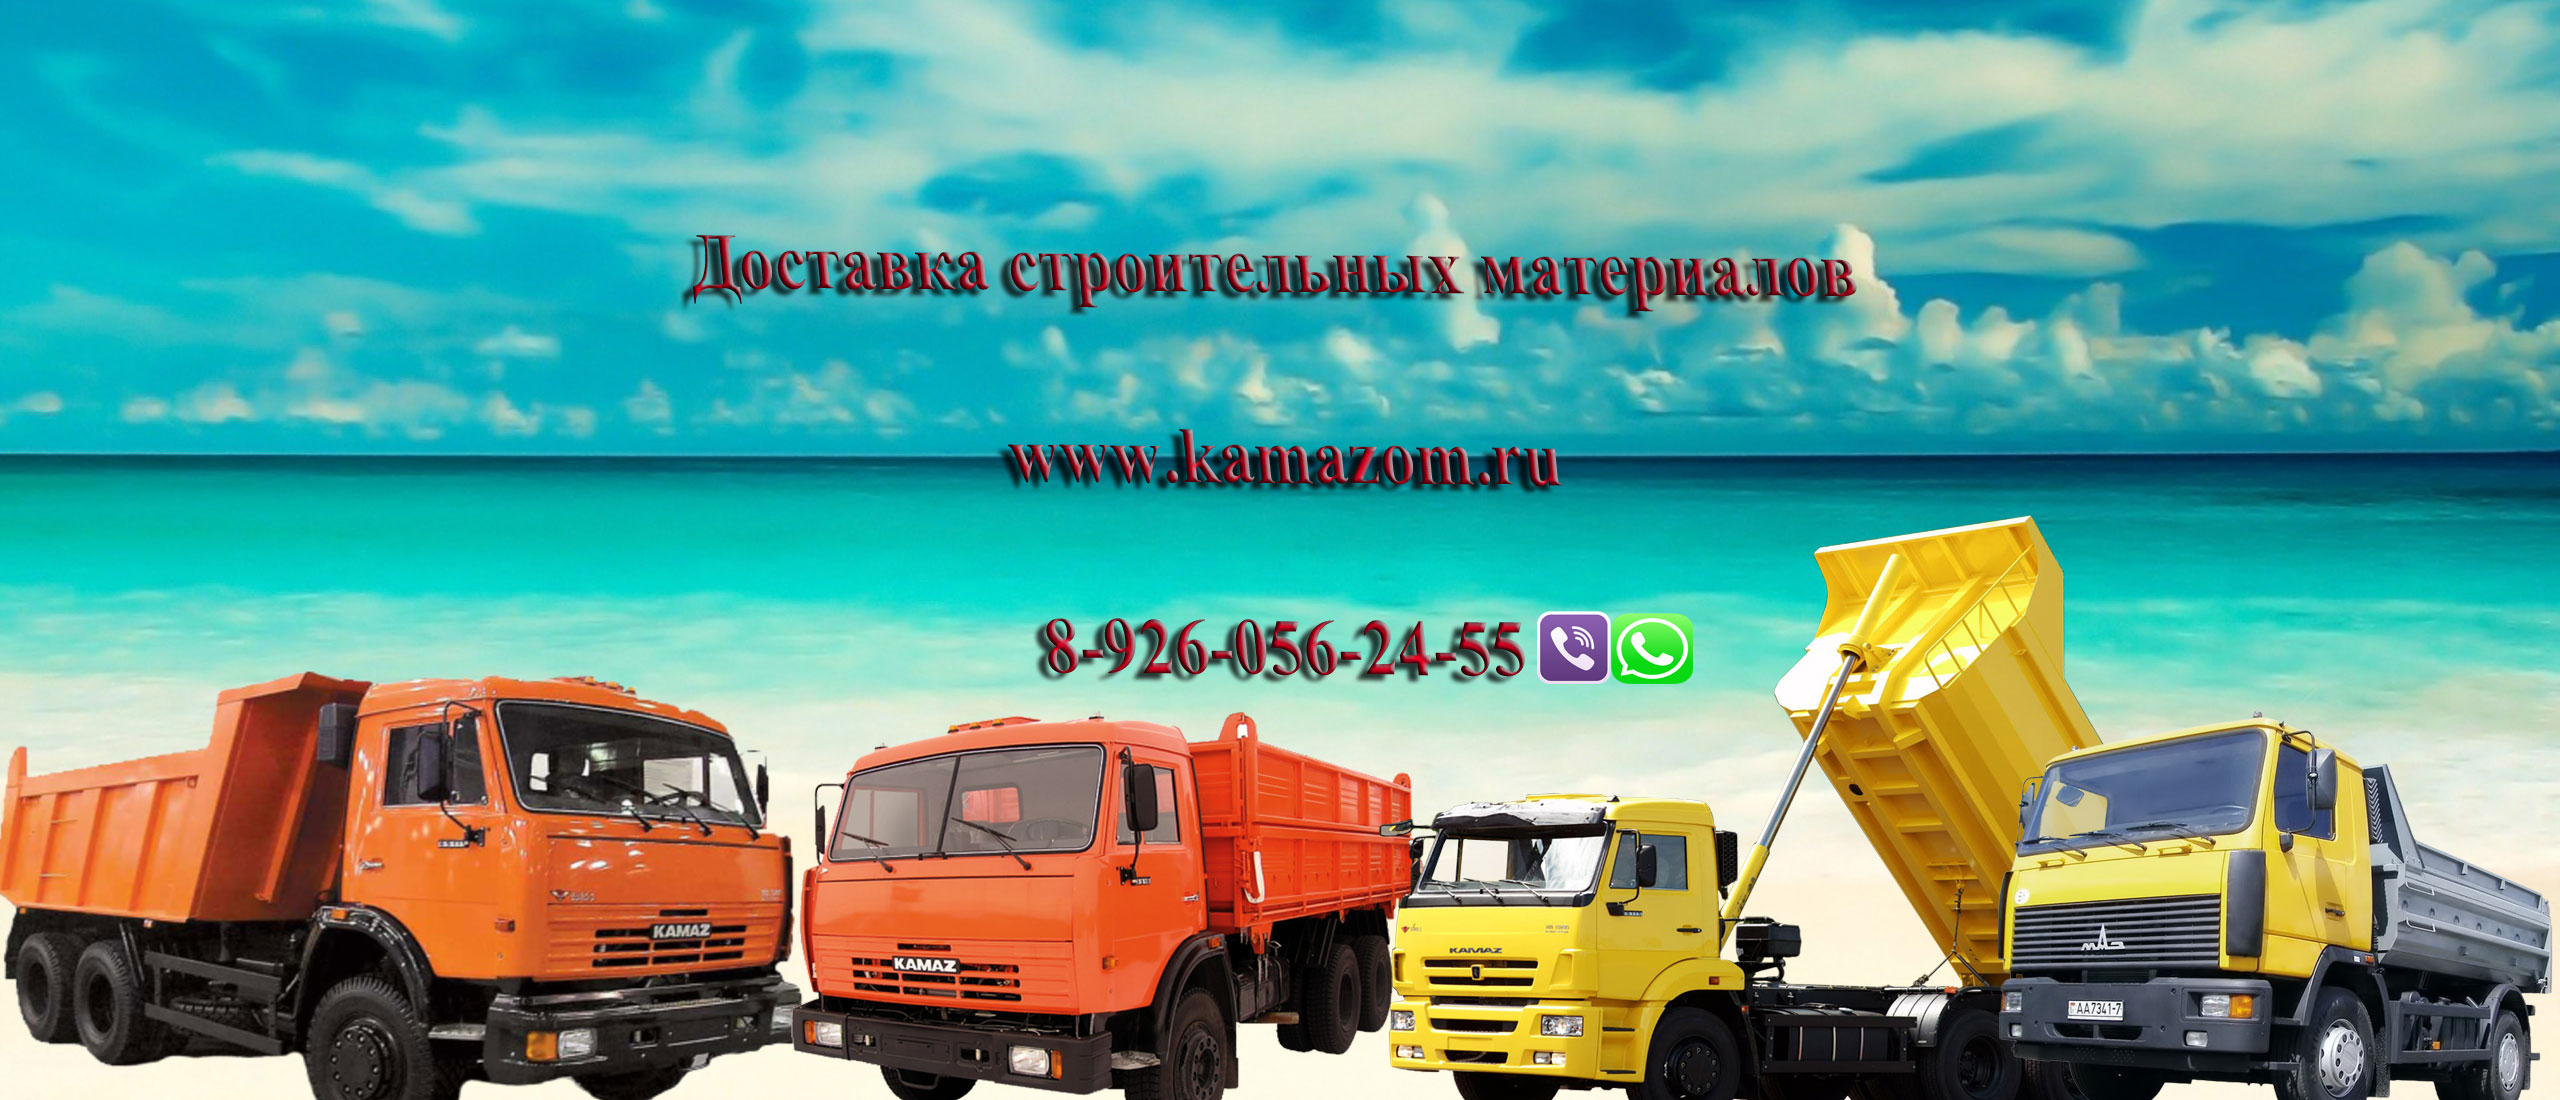 pesok-s-dostavkoi